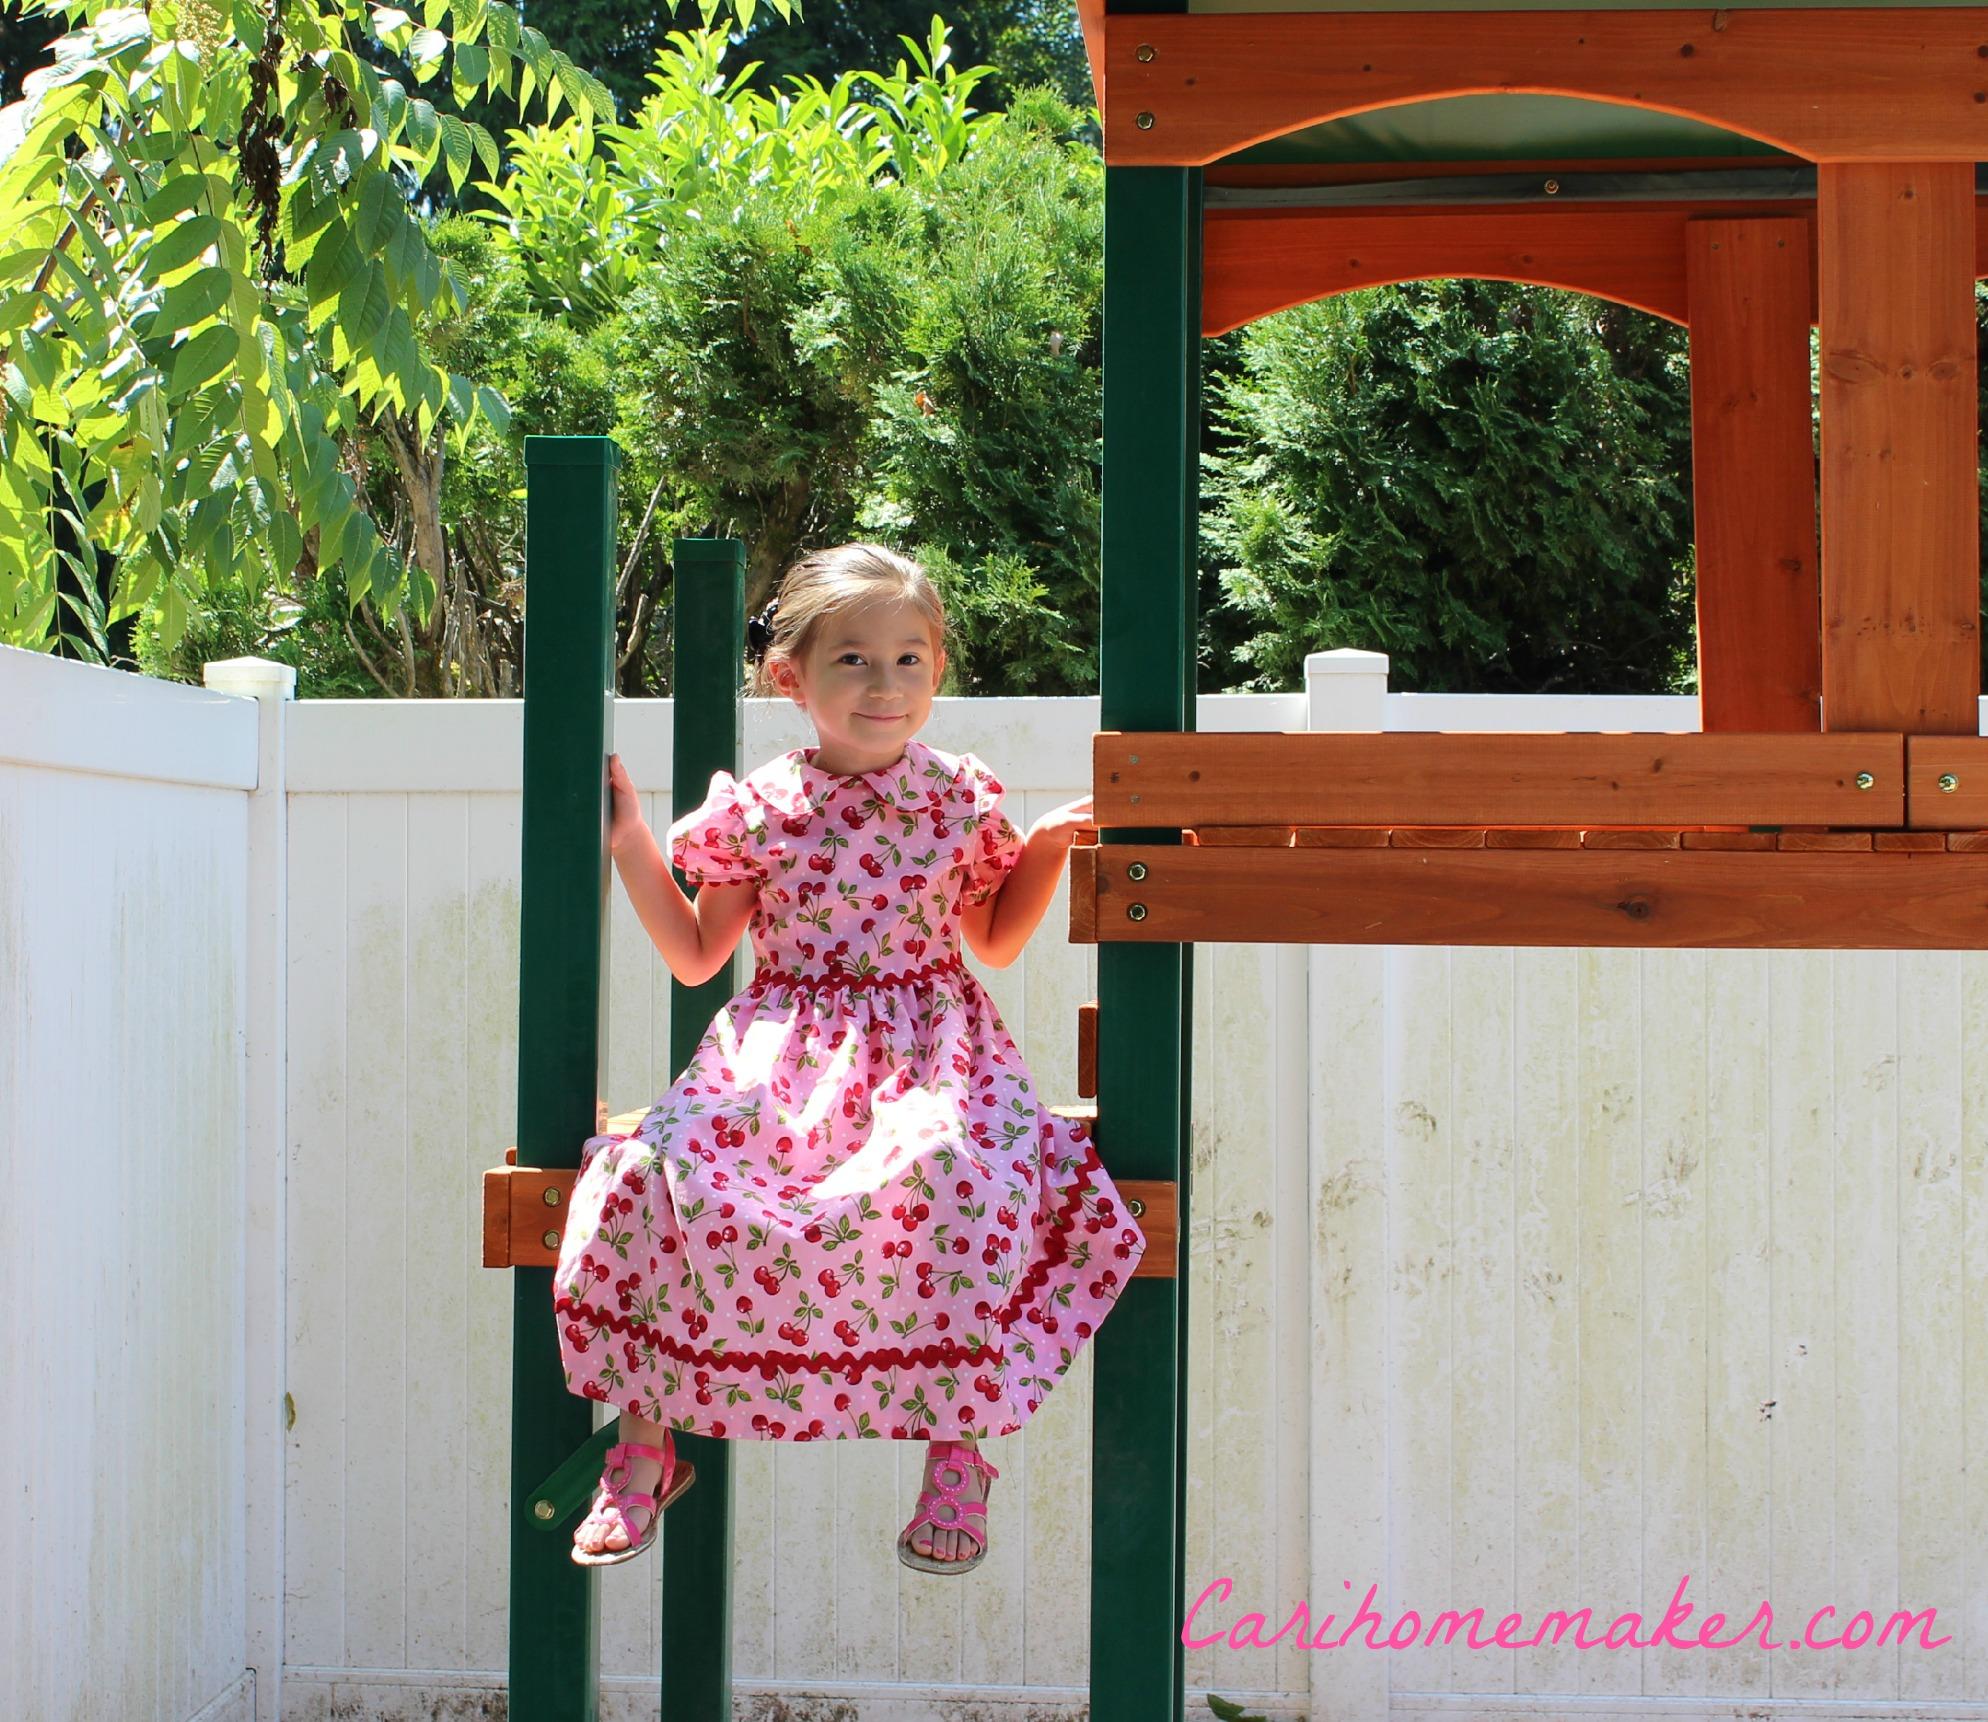 Dress on swingset